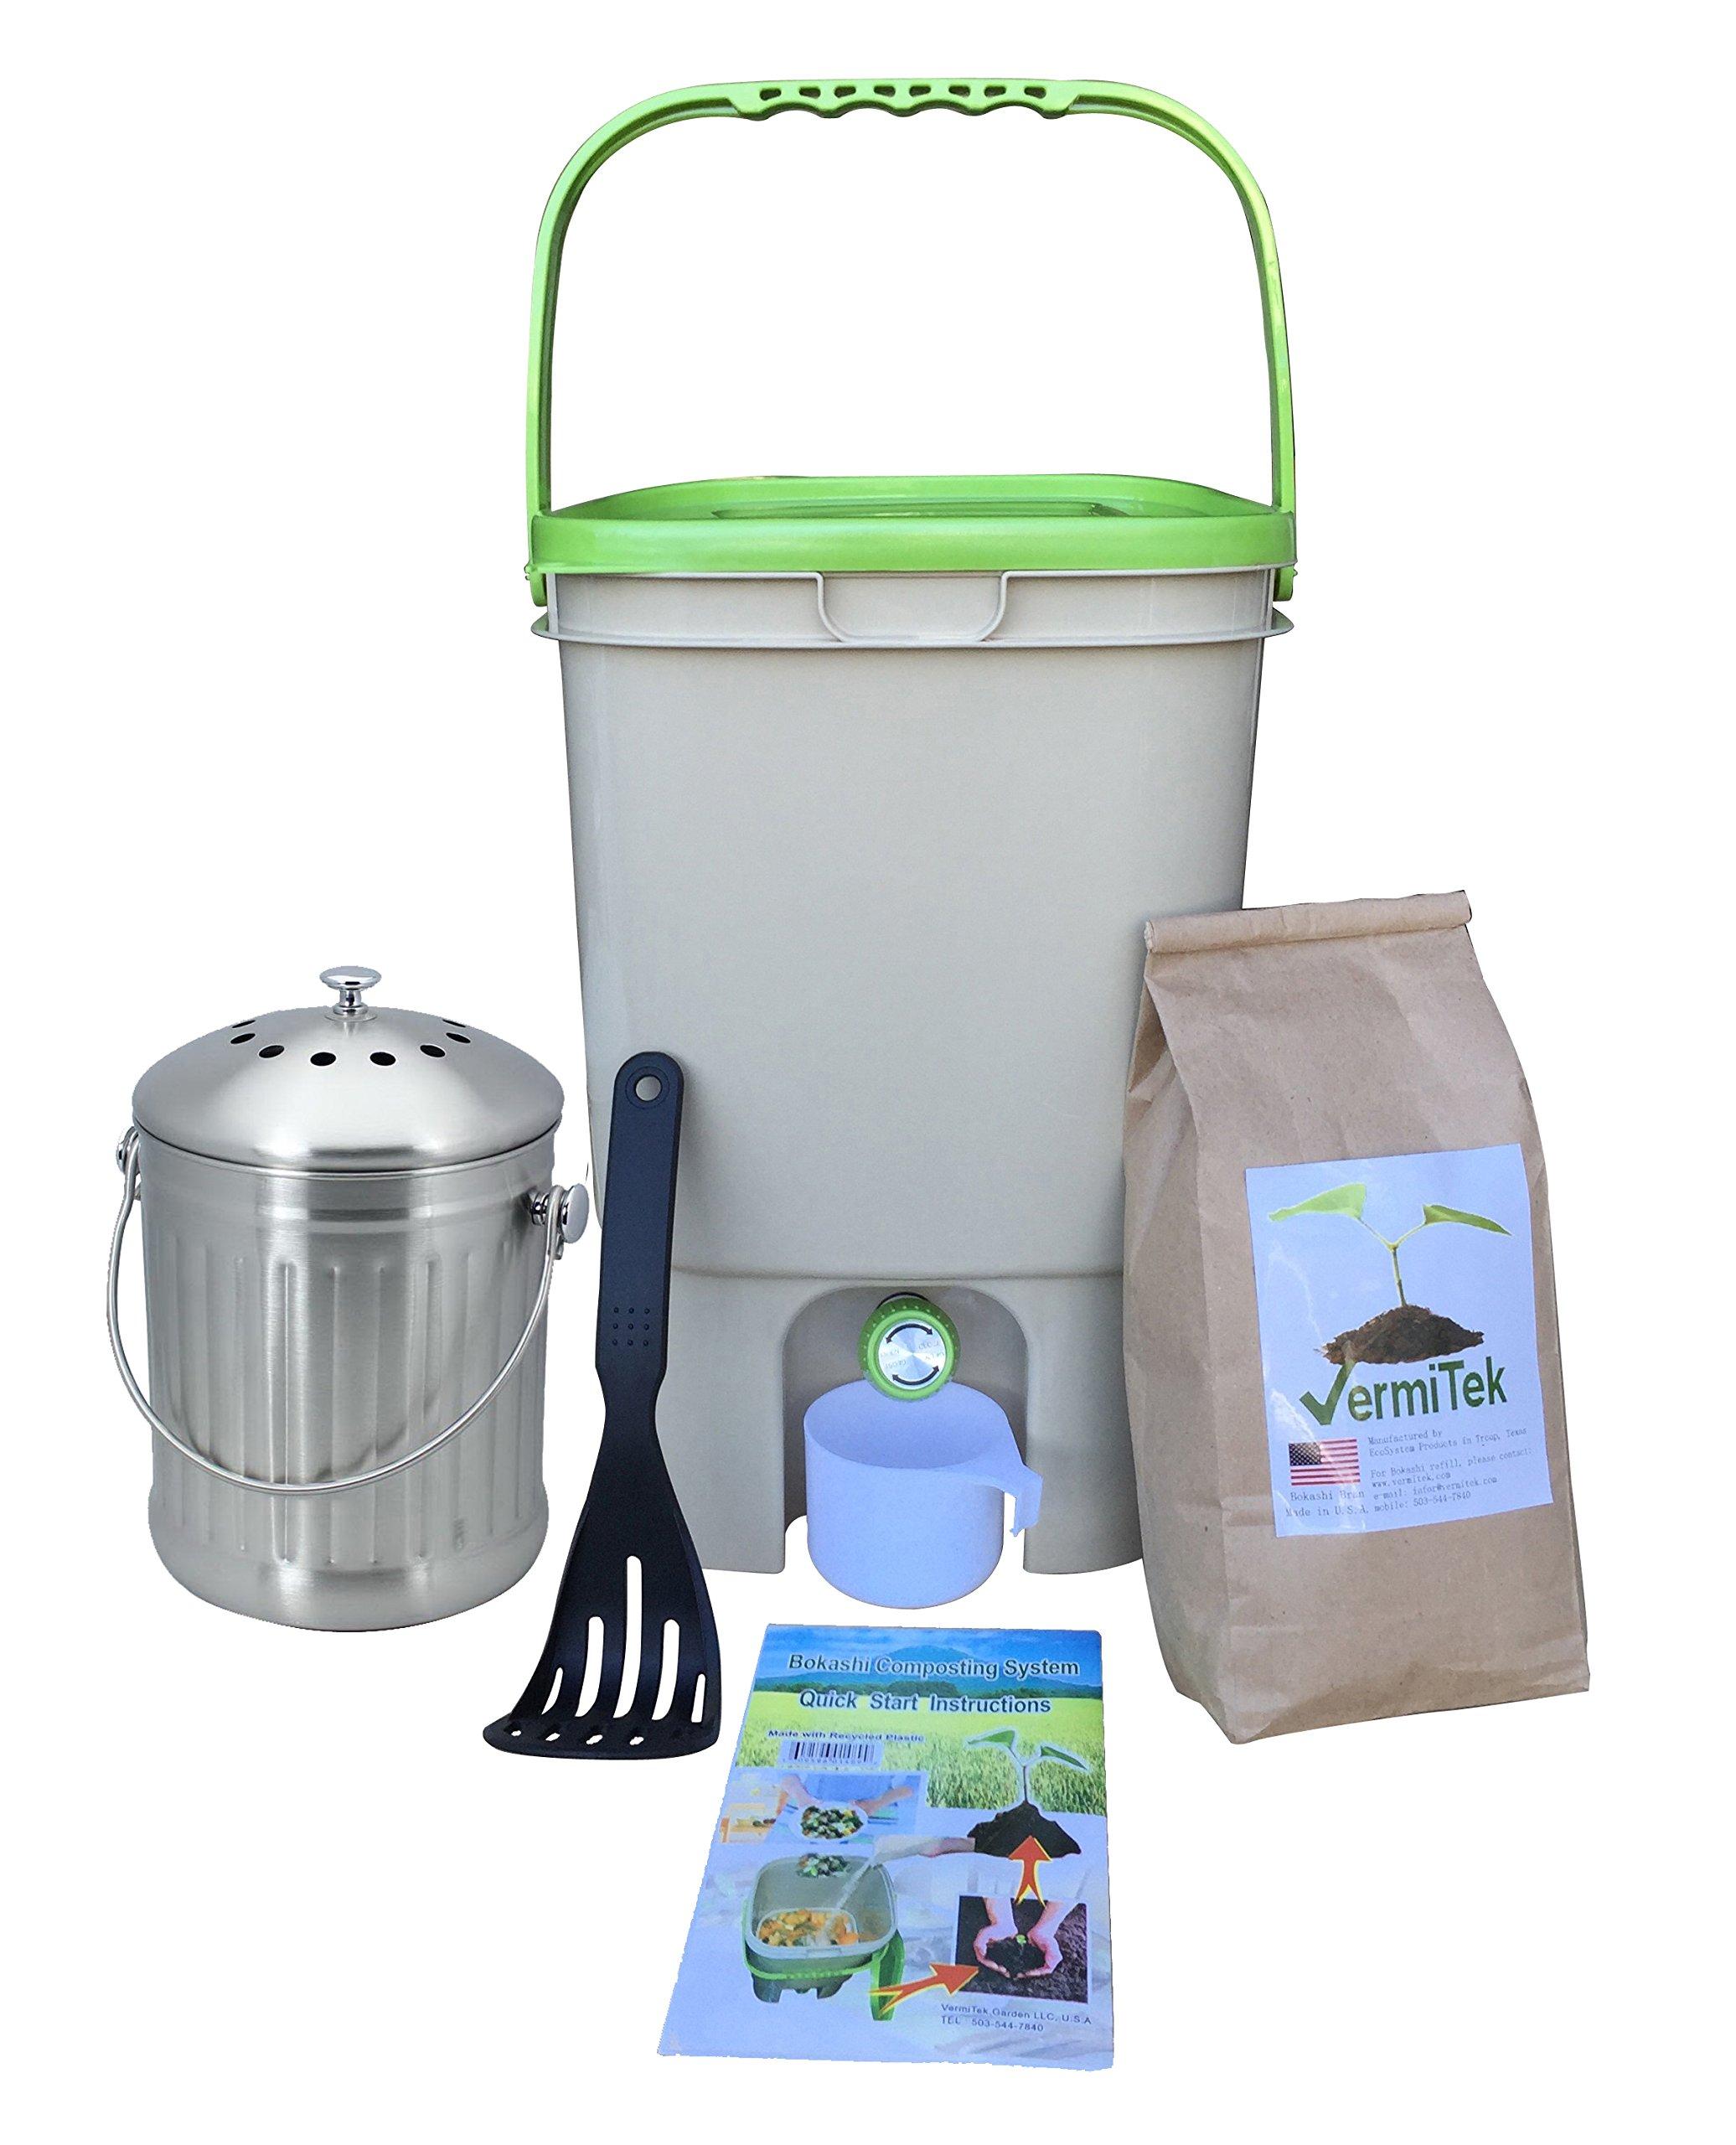 Vermikashi Bokashi Compost Kit Deluxe Model